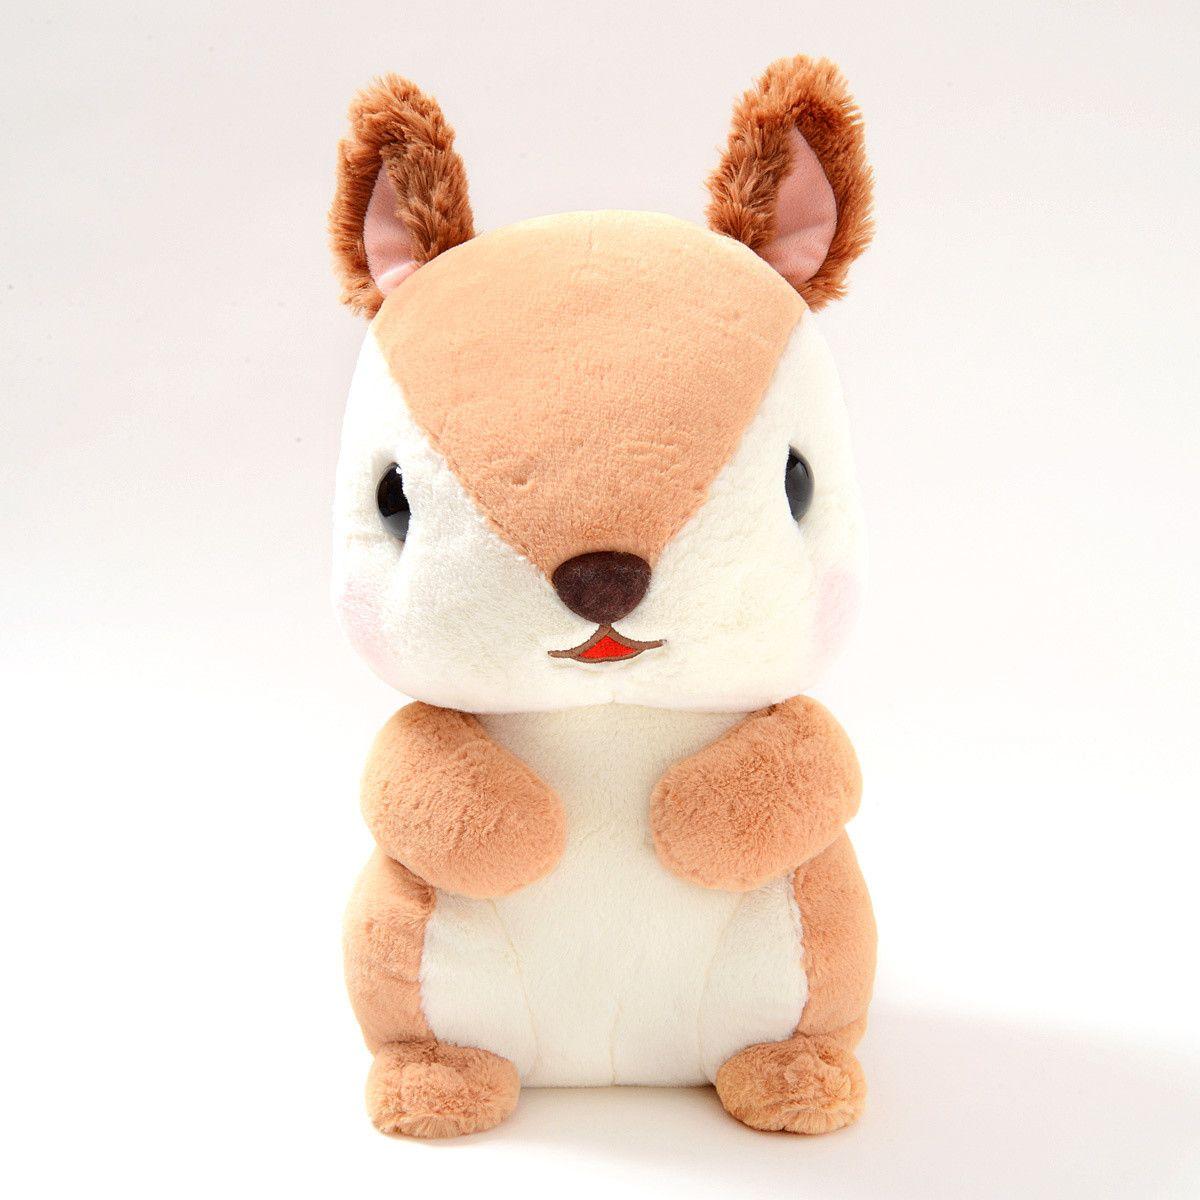 Korisu No Dongurin Lovely Squirrel Plush Collection Big Squirrel Plushies Cuddly [ 1200 x 1200 Pixel ]